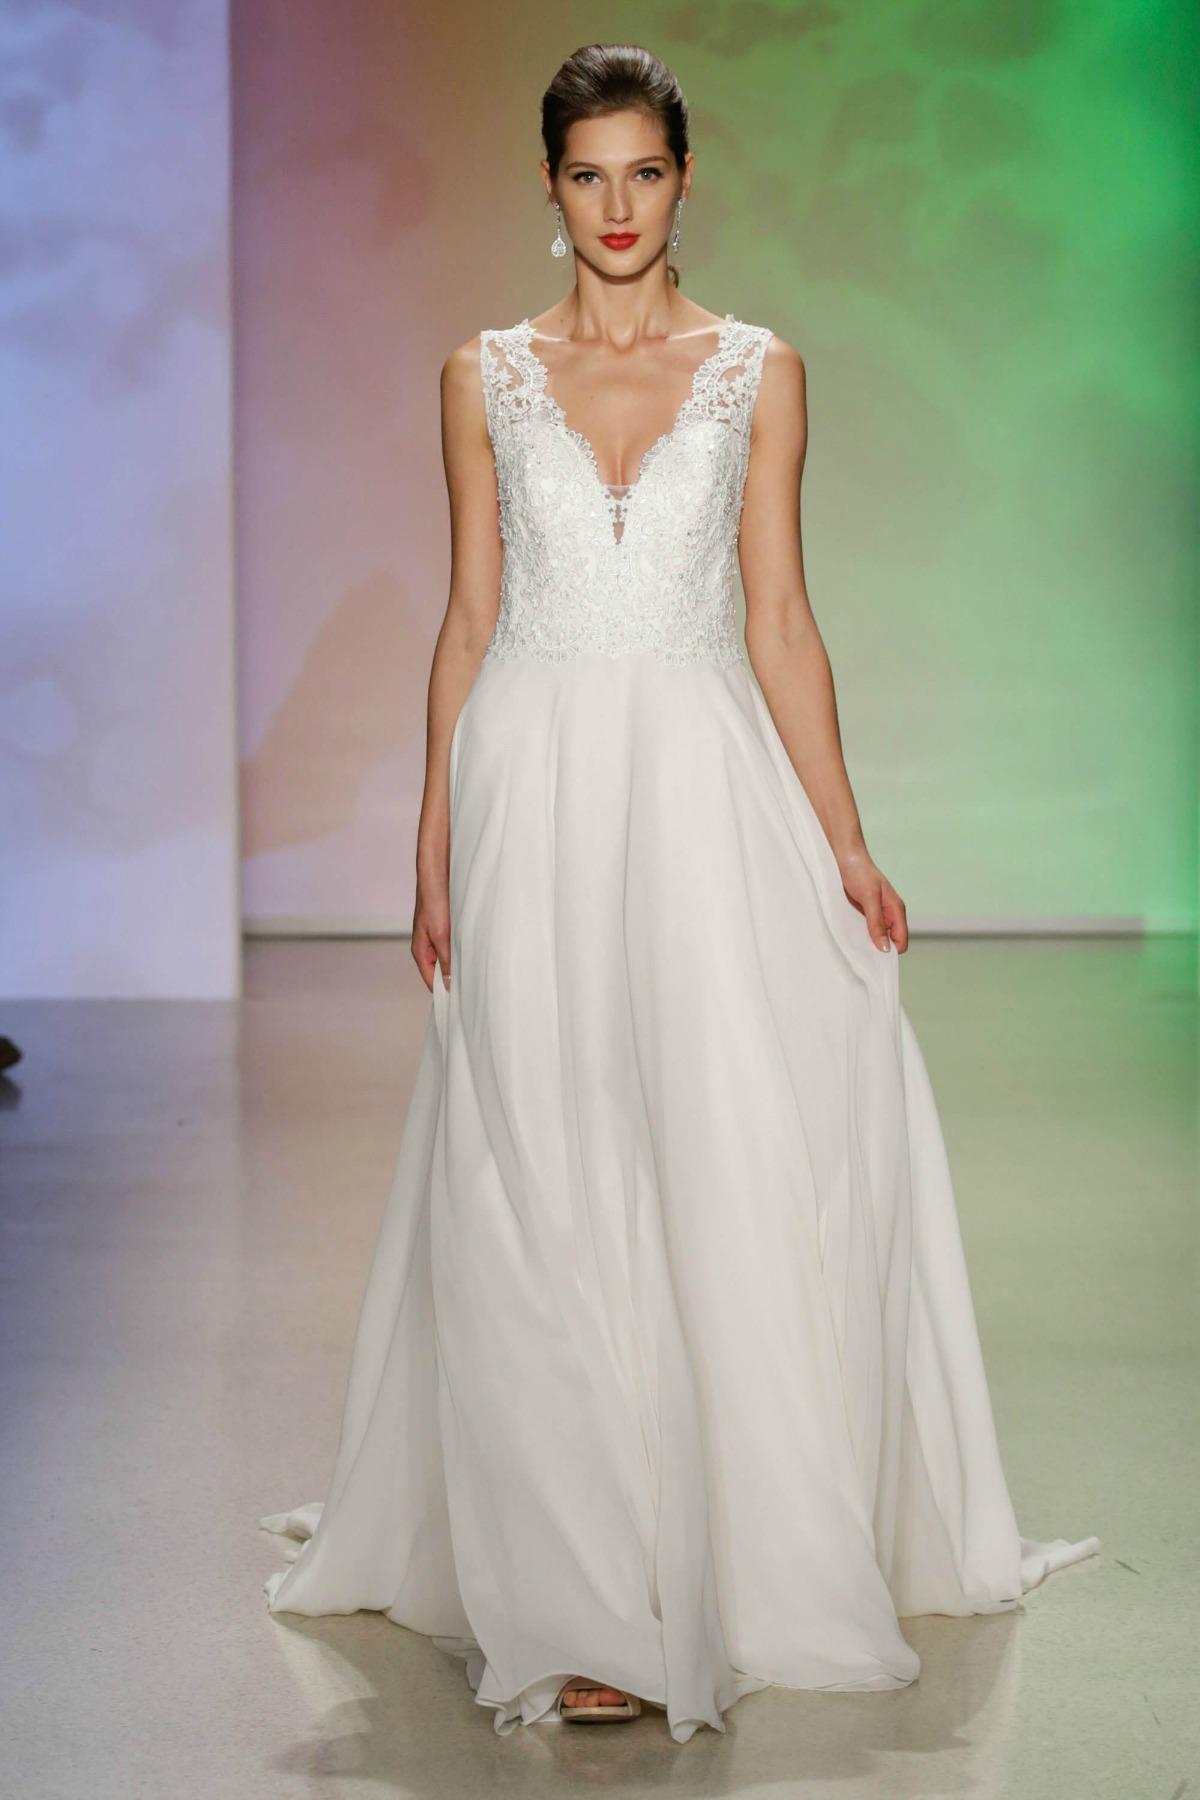 disney wedding dresses photo - 1